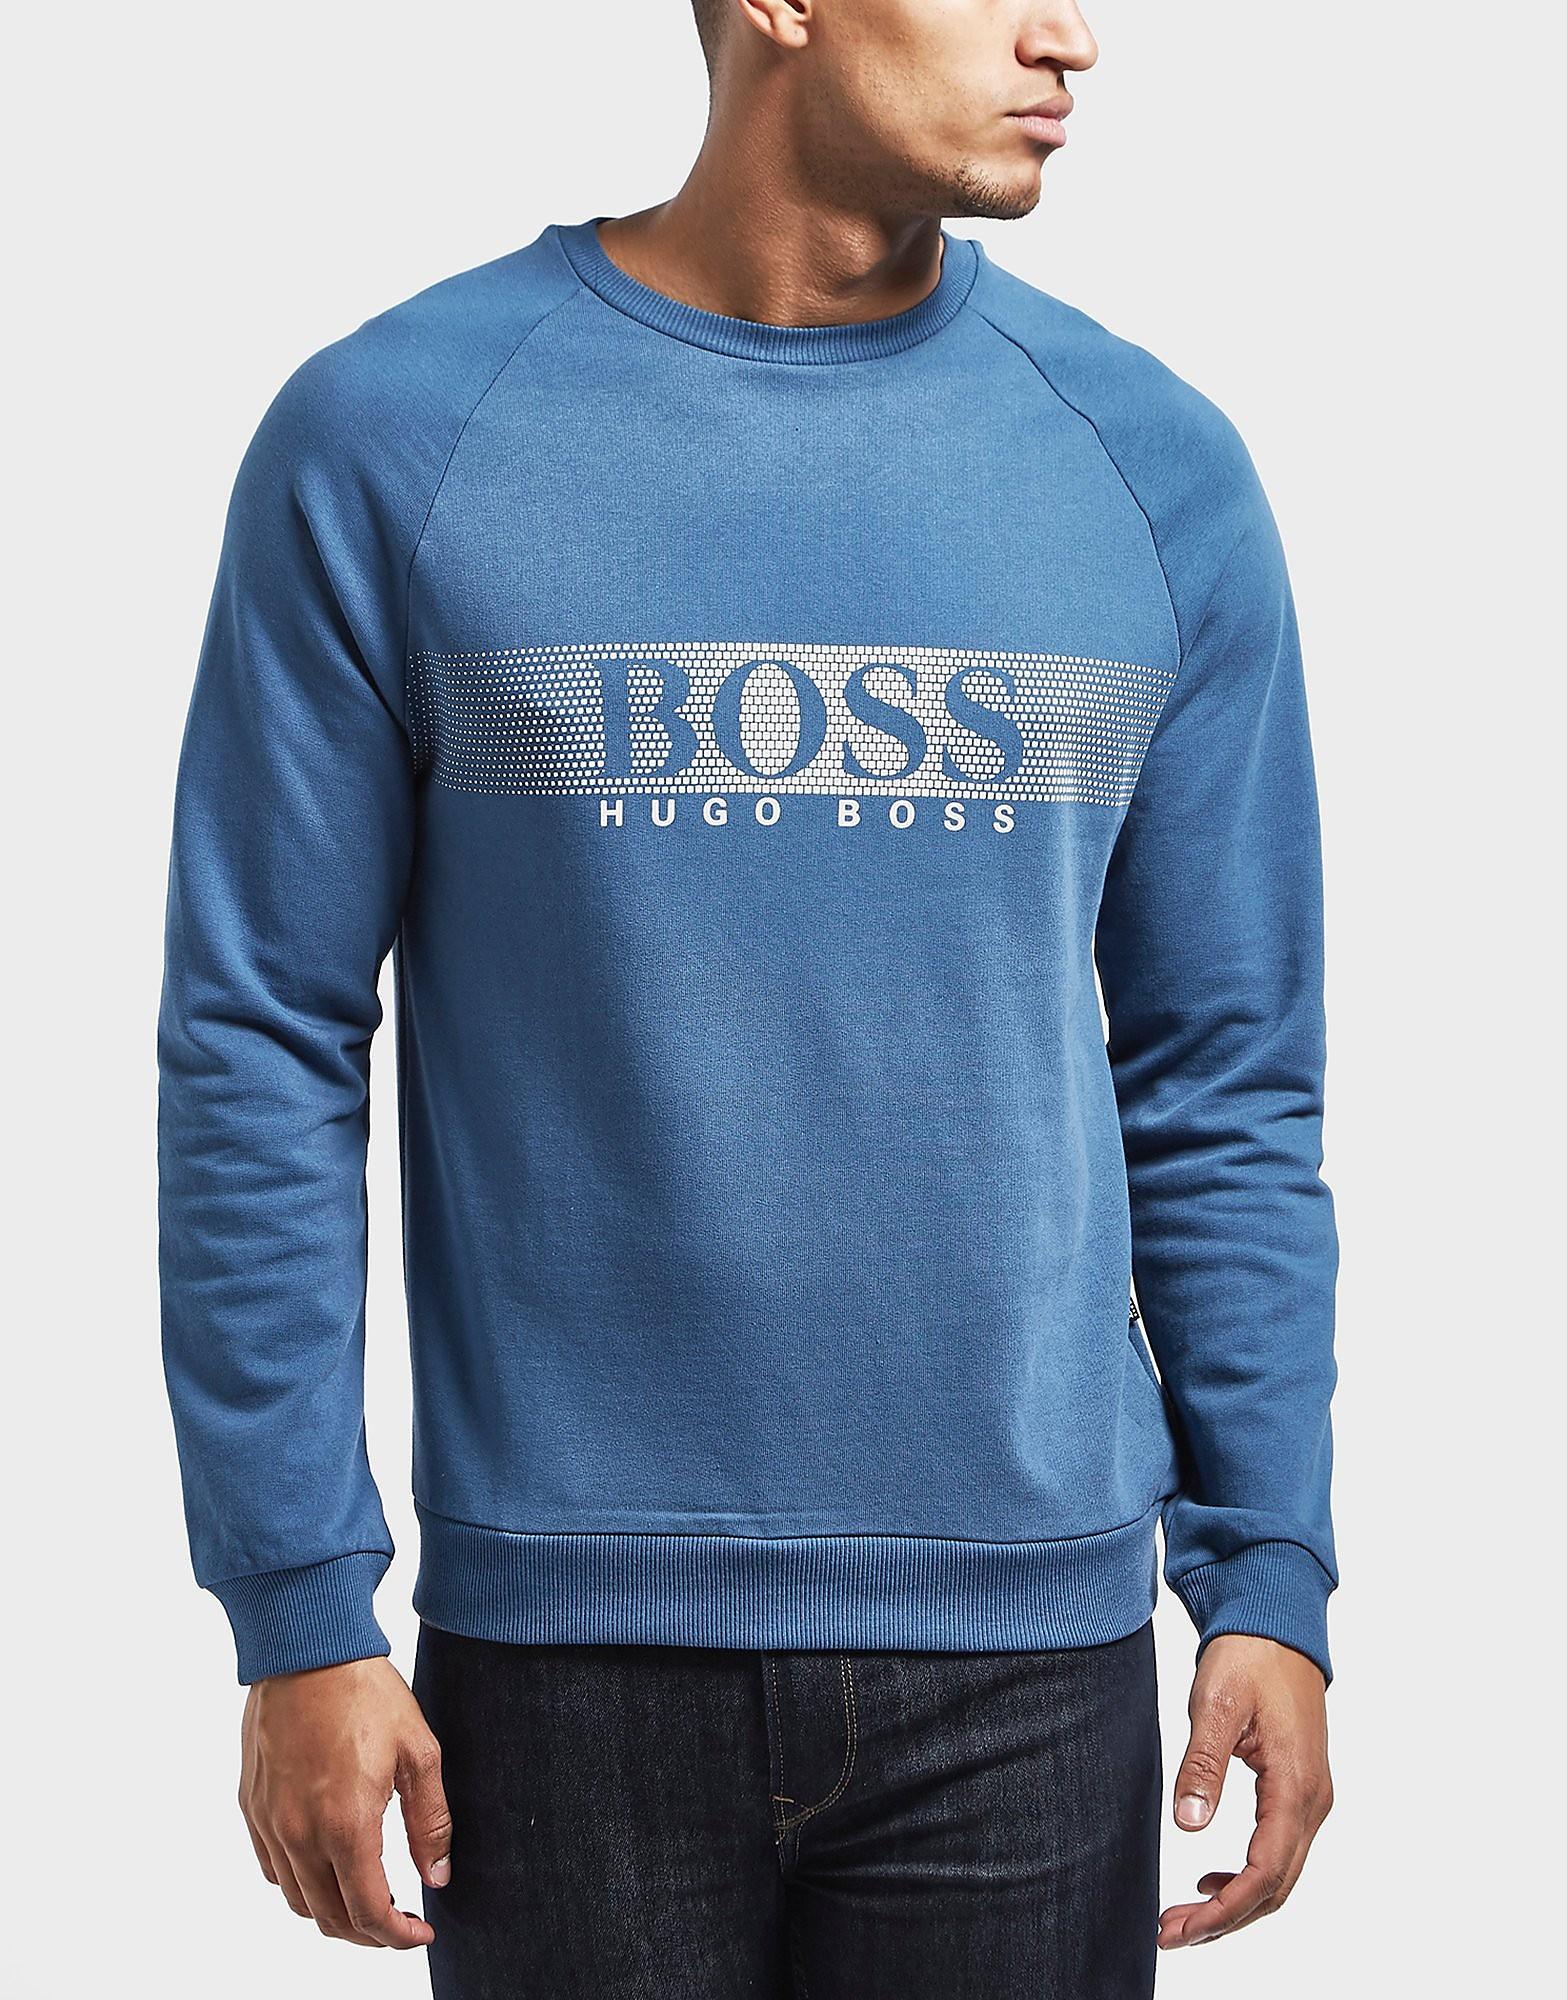 BOSS Swim Crew Neck Sweatshirt